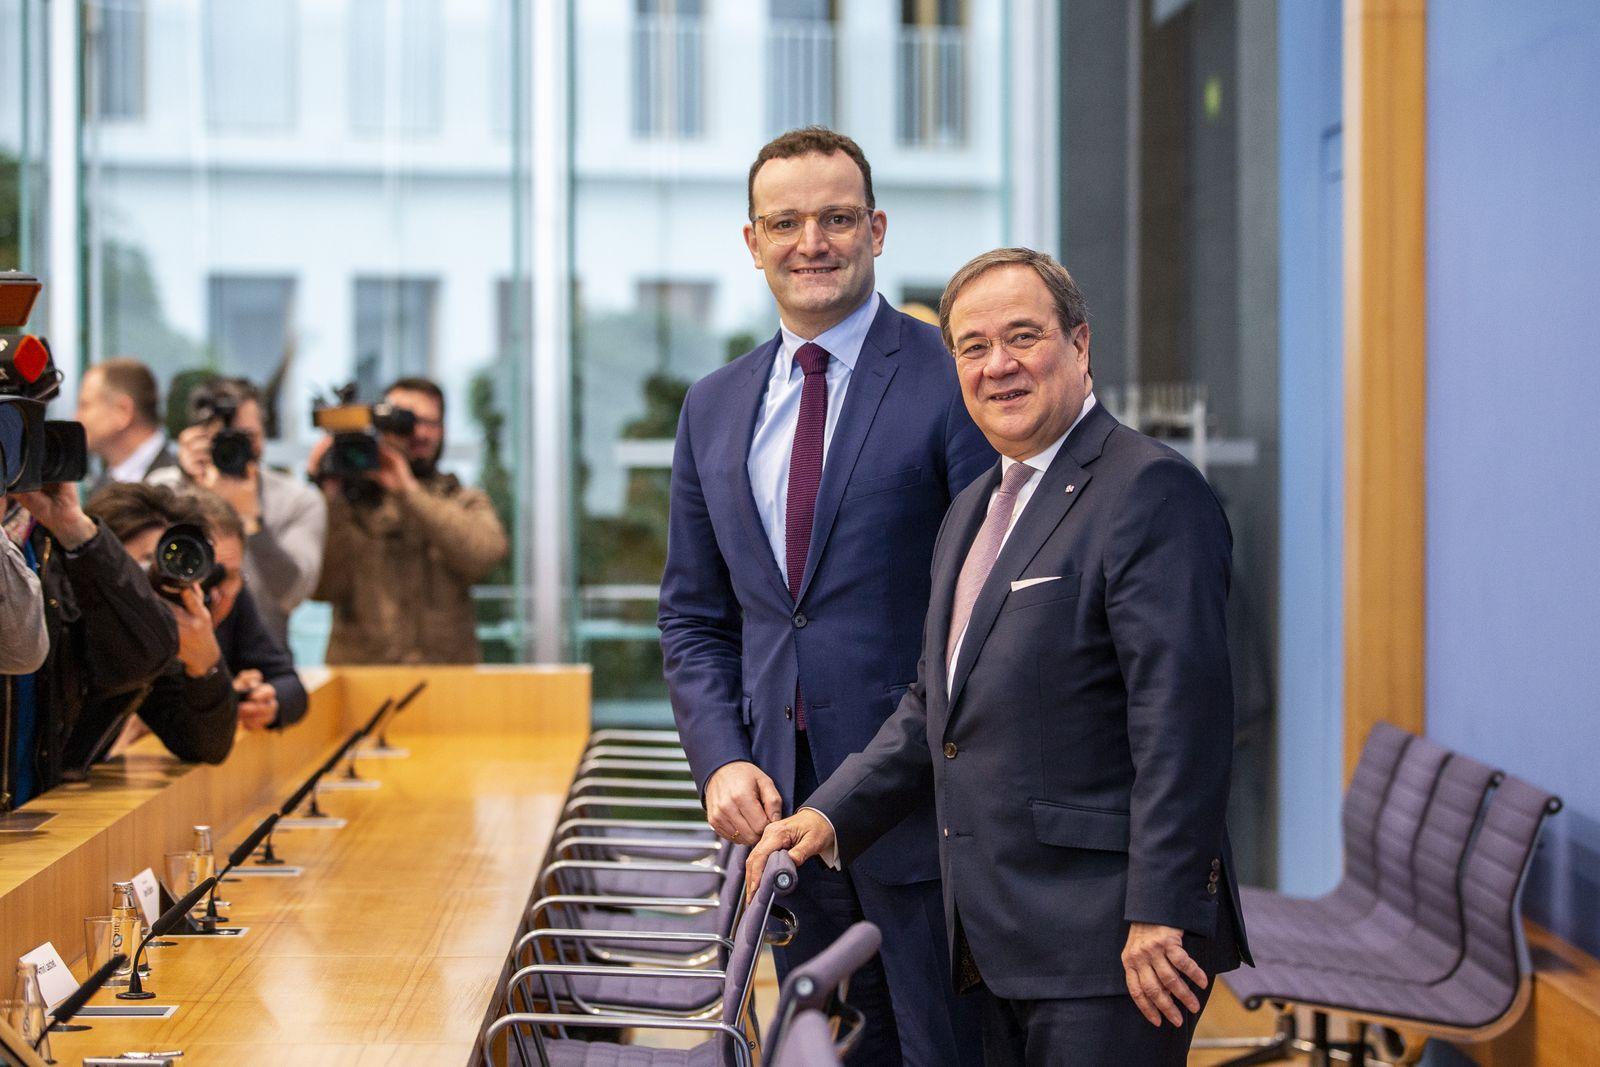 ***BESTPIX*** Merz And Laschet Announce CDU Leadership Candidacies, Spahn Declines